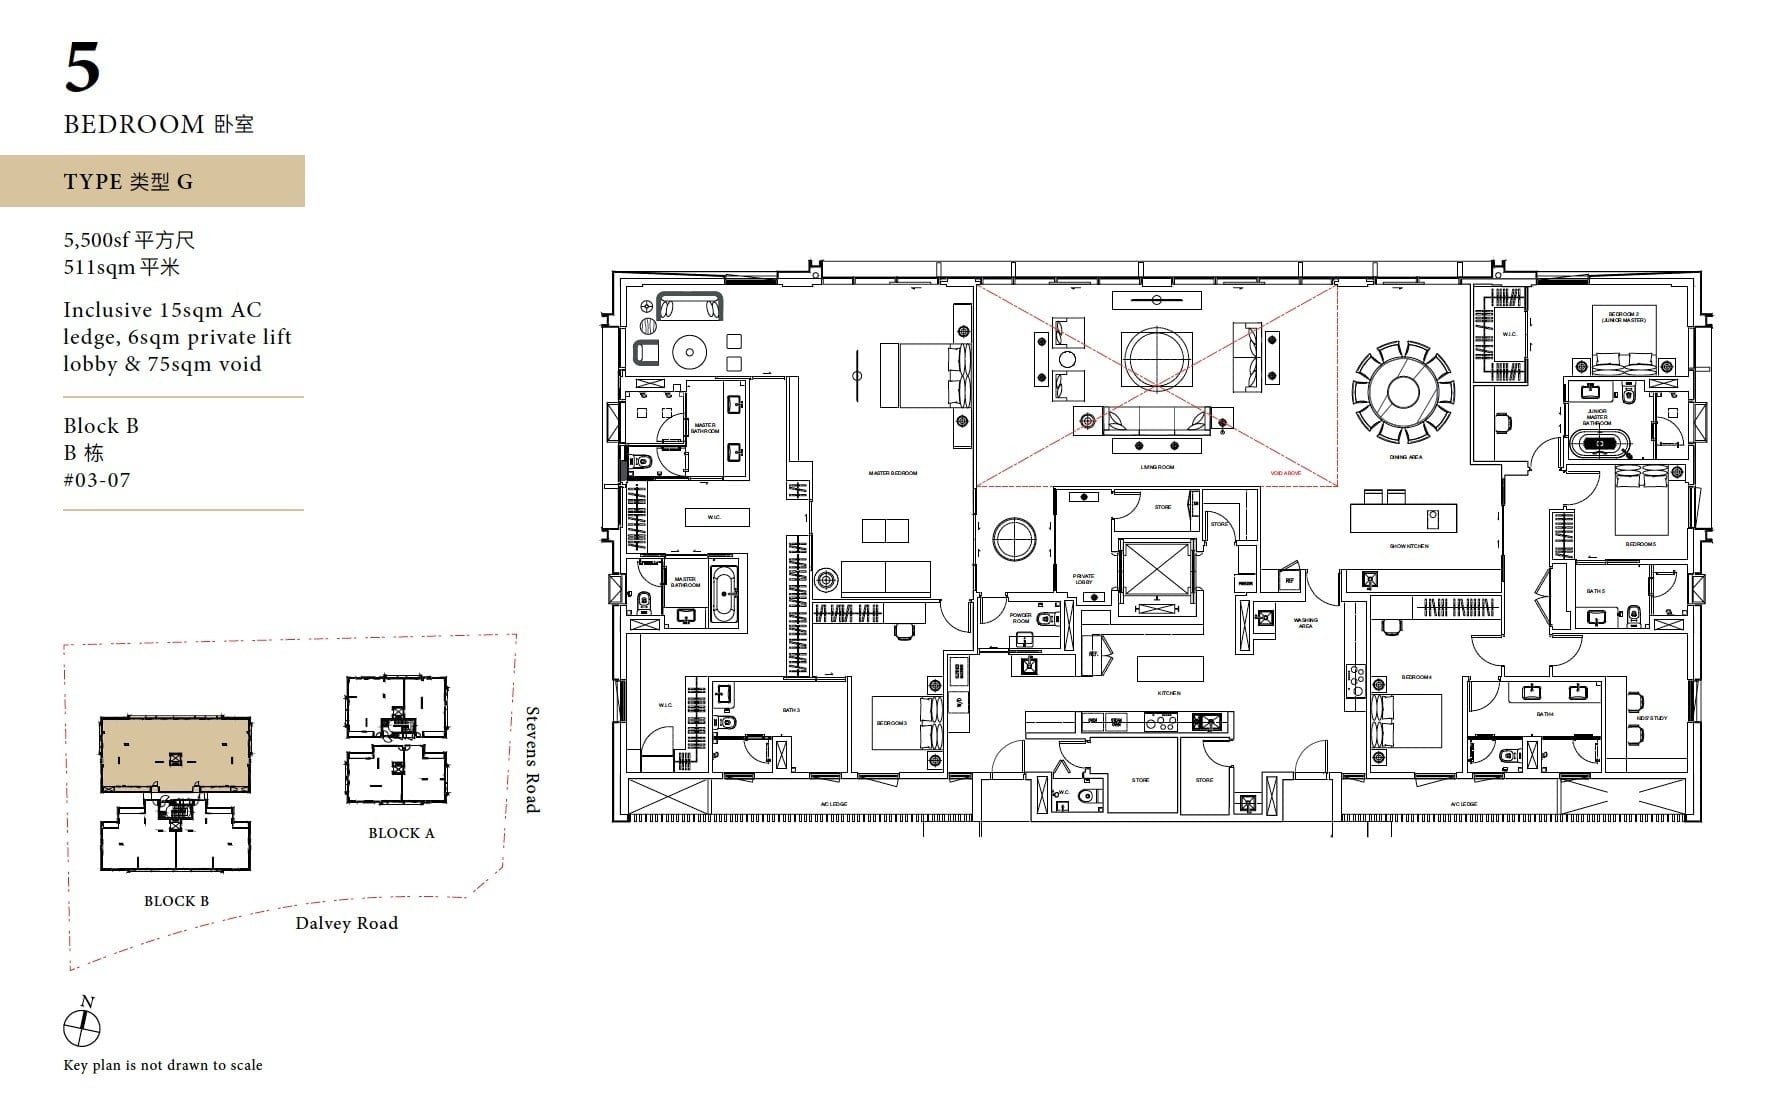 Davey Haus floor plan 5BR G